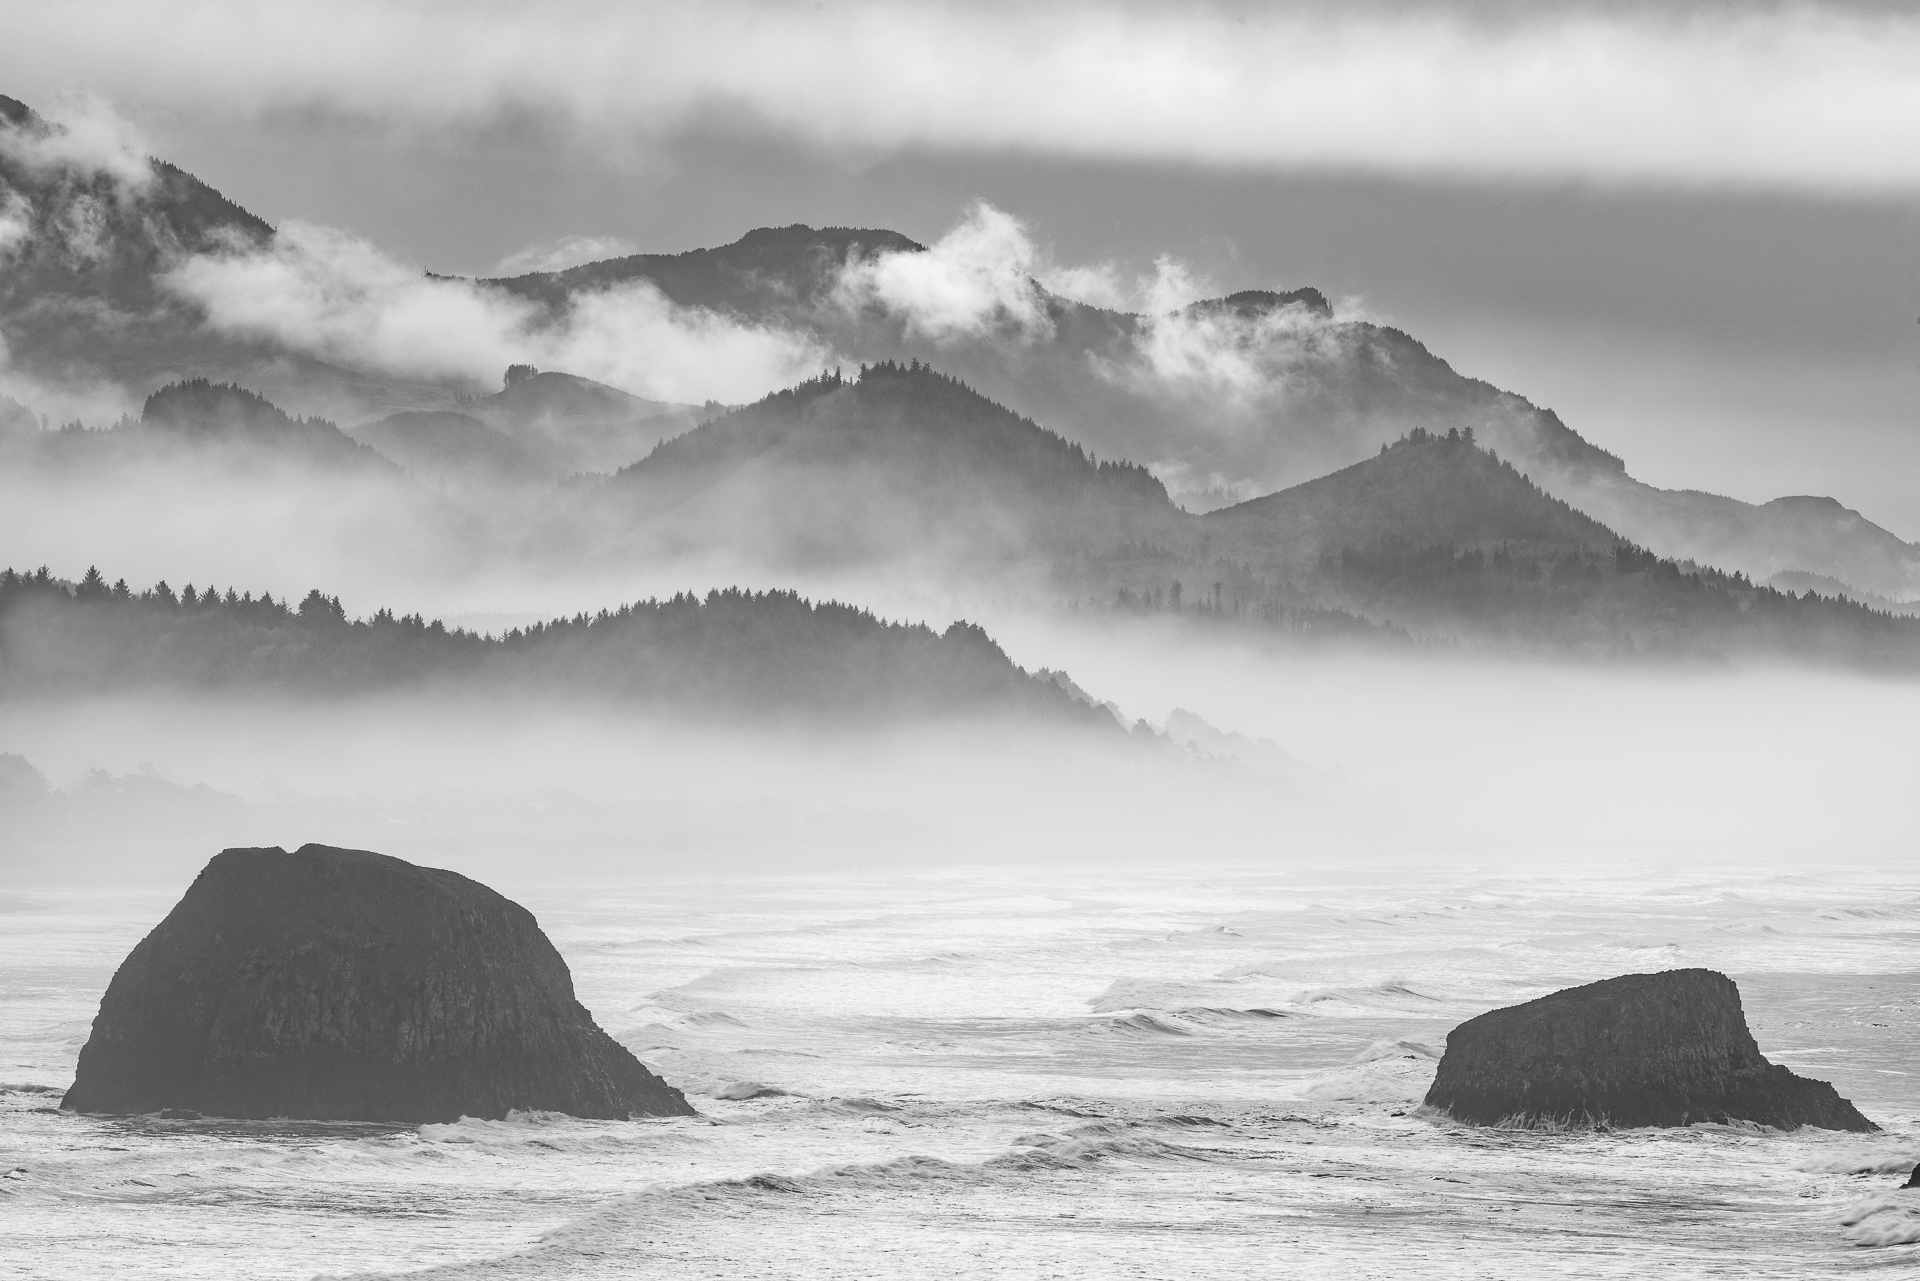 Fog along the Pacific Coast